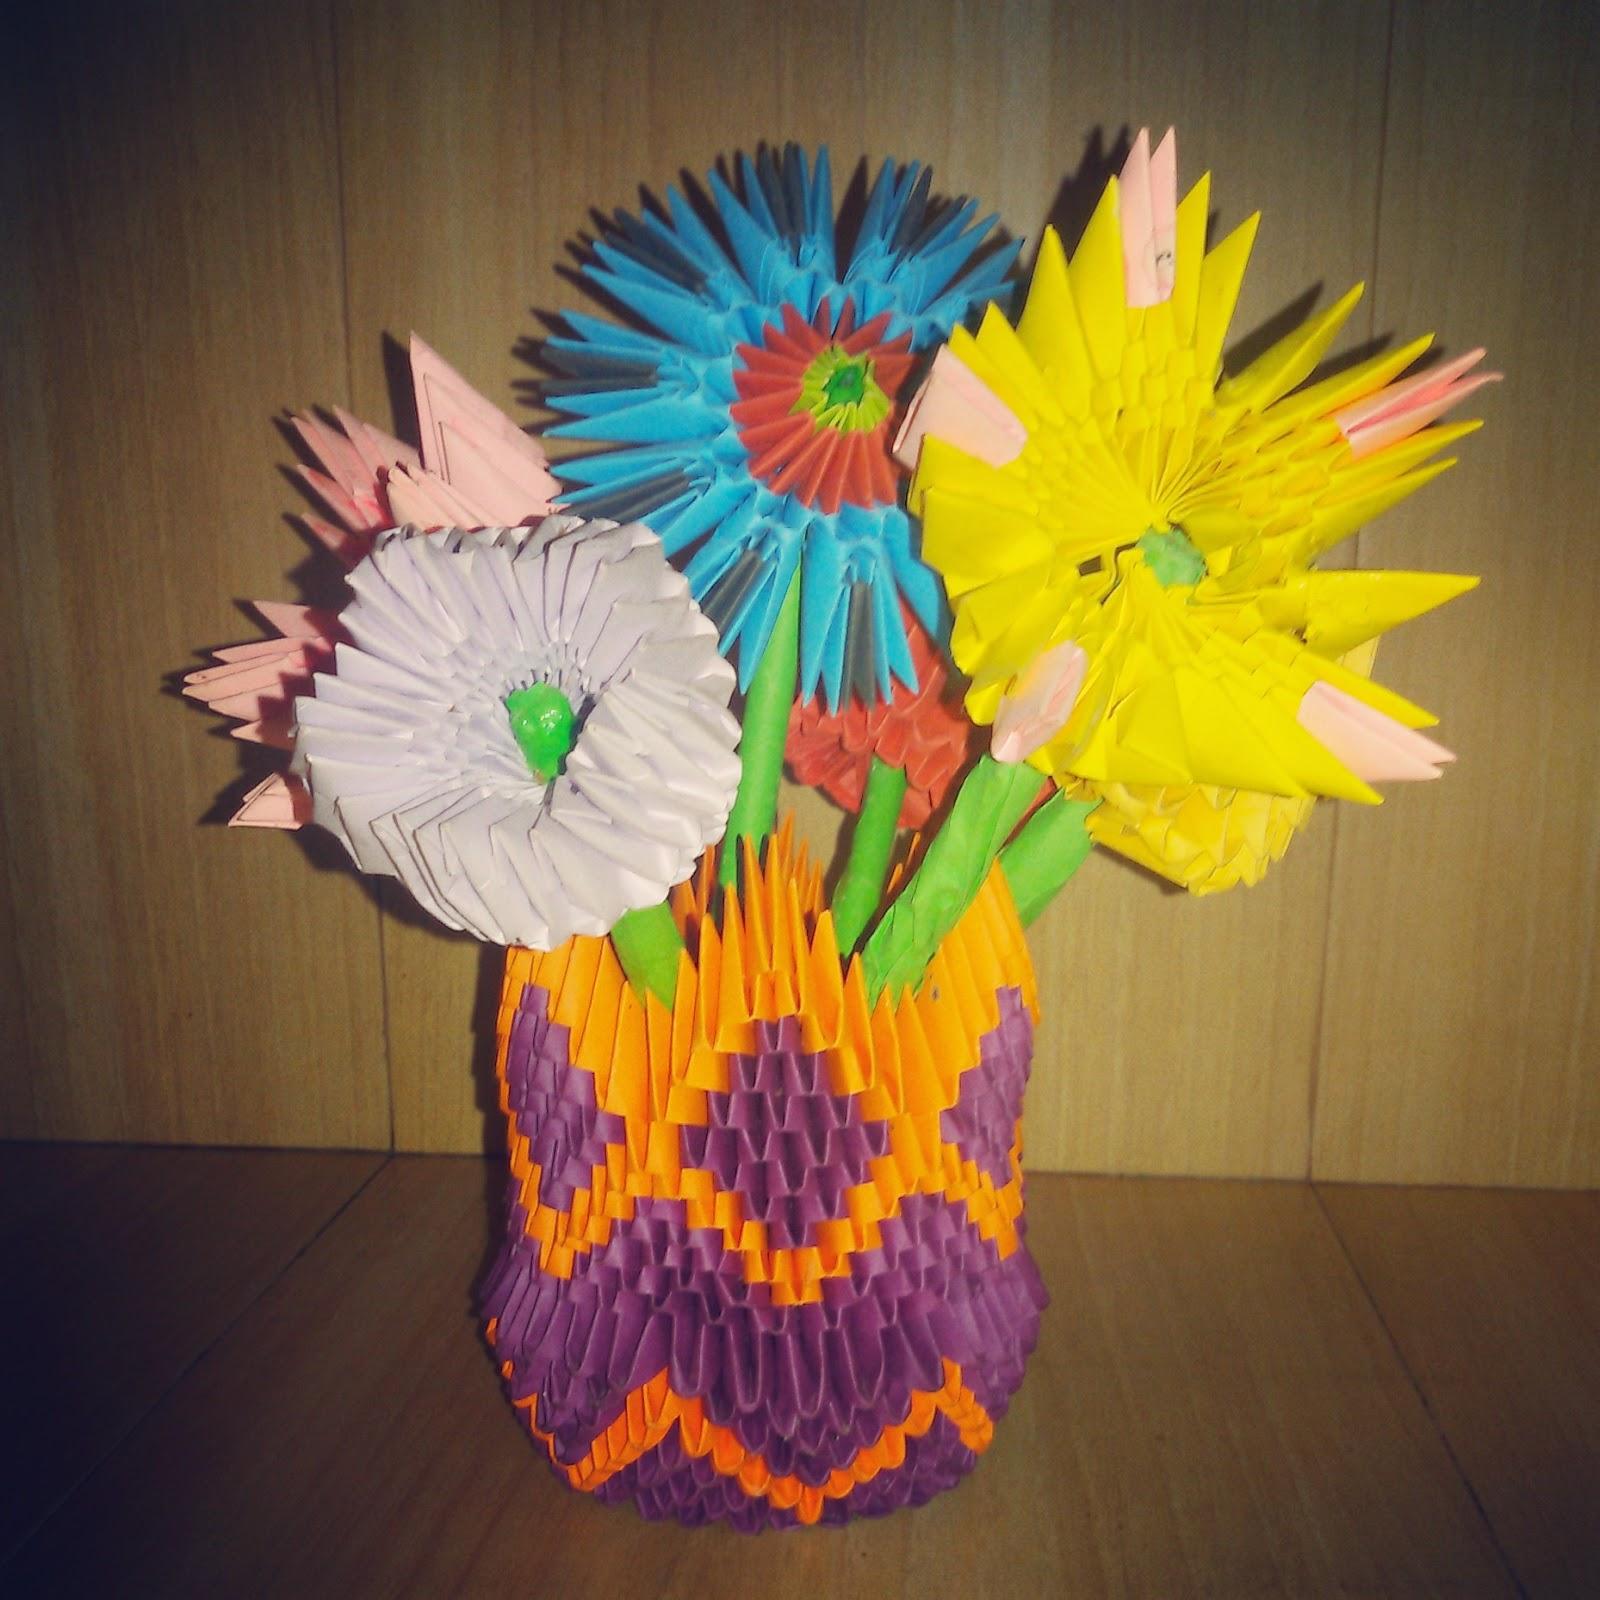 Madushis Crafts 3d Origami Flower Vase